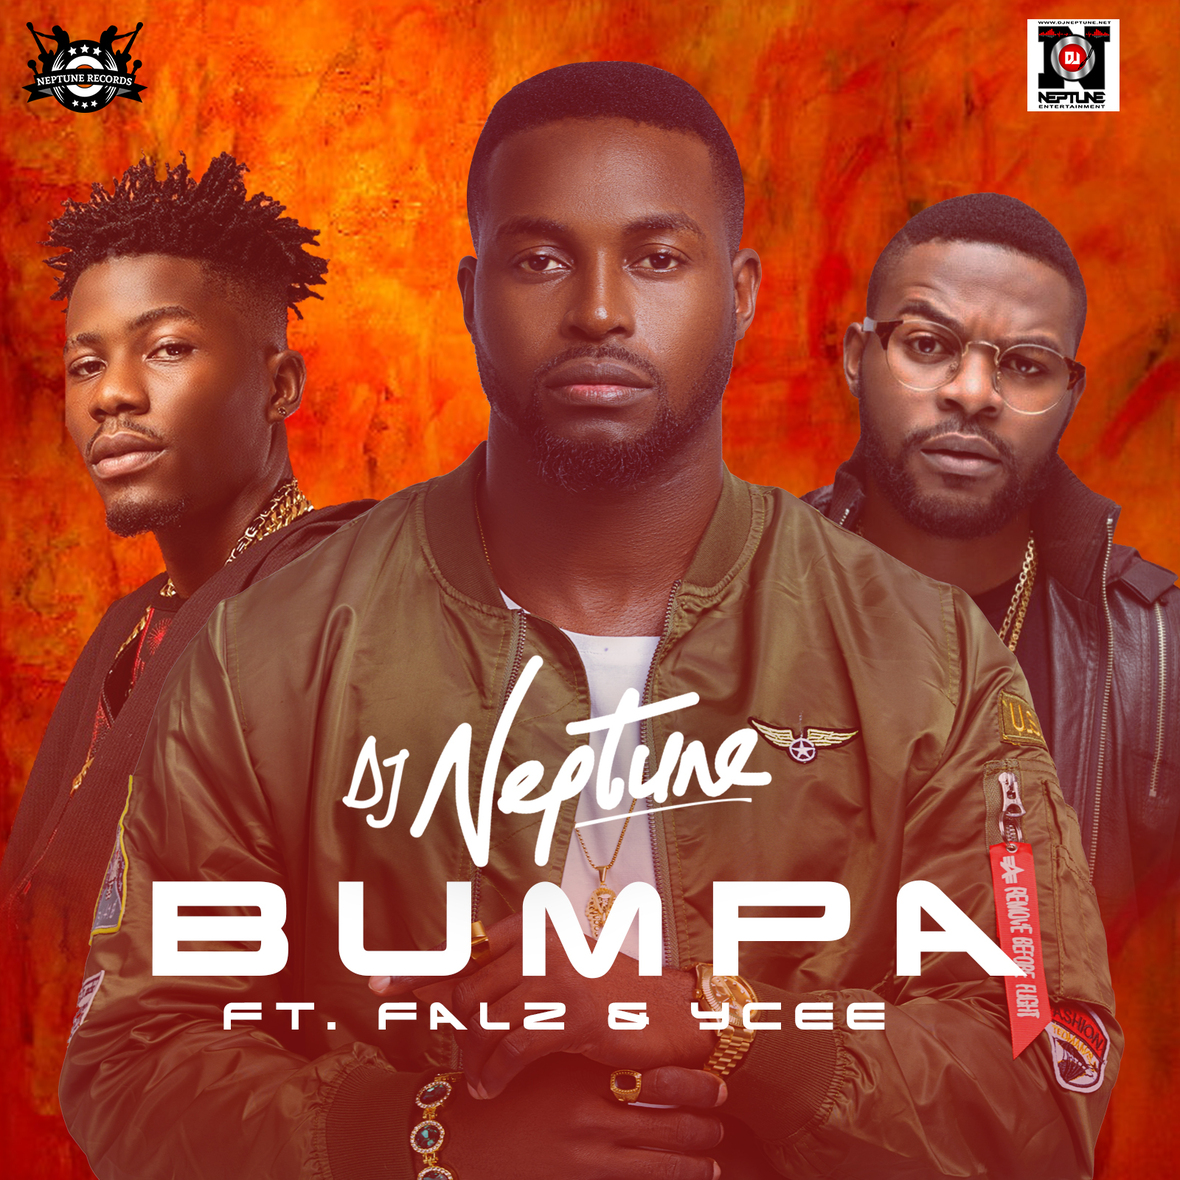 Instrumental: DJ Neptune – Bumpa ft. Falz & Ycee